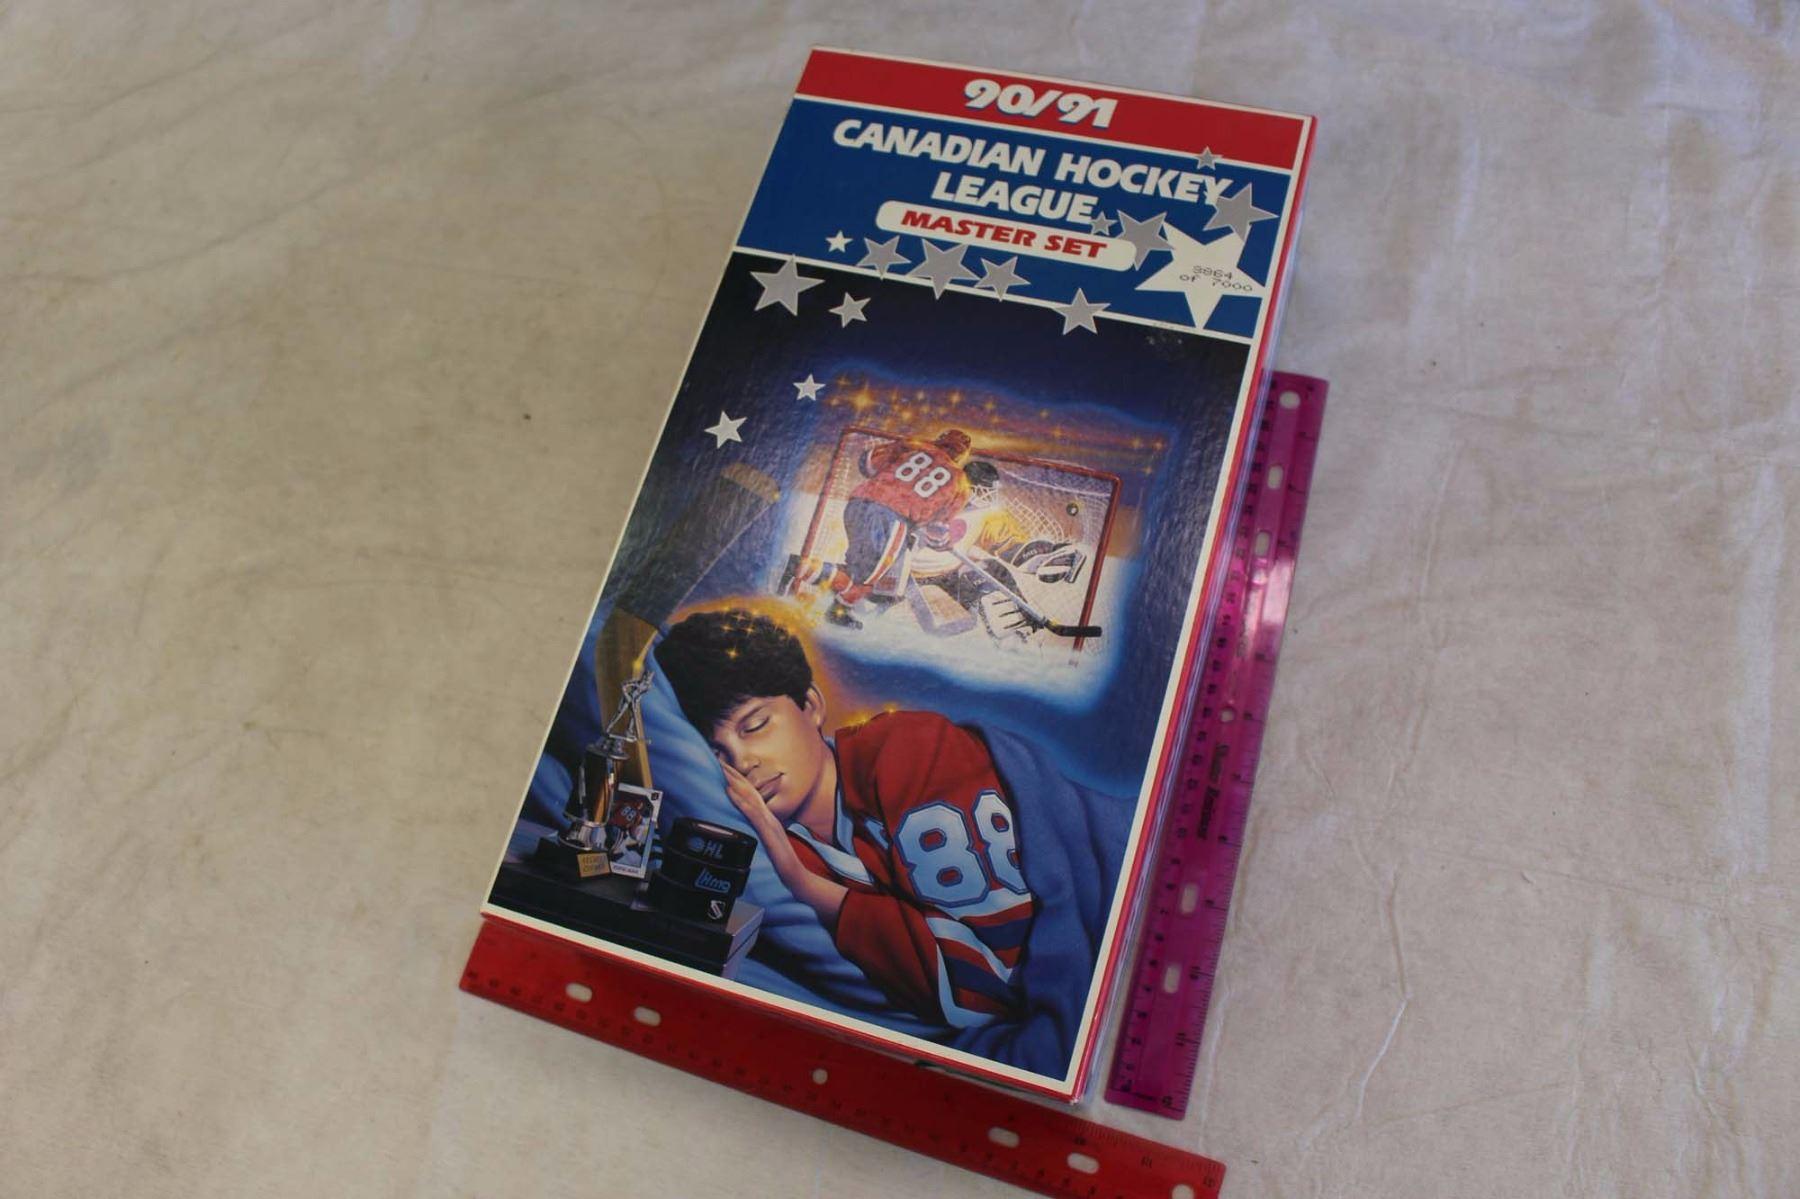 1990-91 Canadian Hockey League Master Set Cards